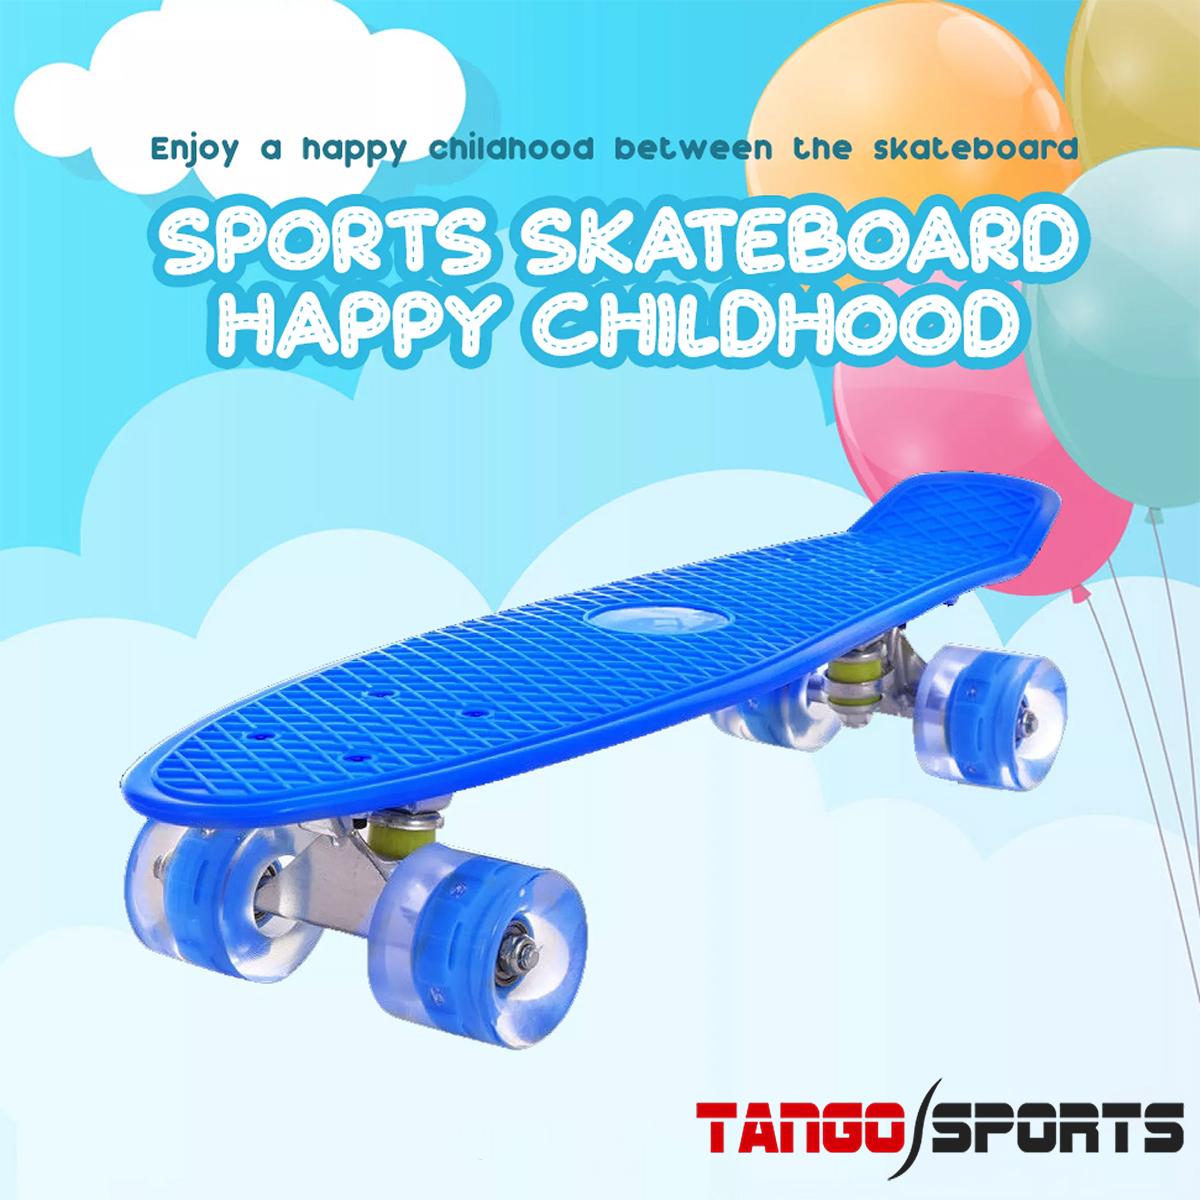 Fiber skateboard 22 inch for boys and girls - Breakproof skate boards